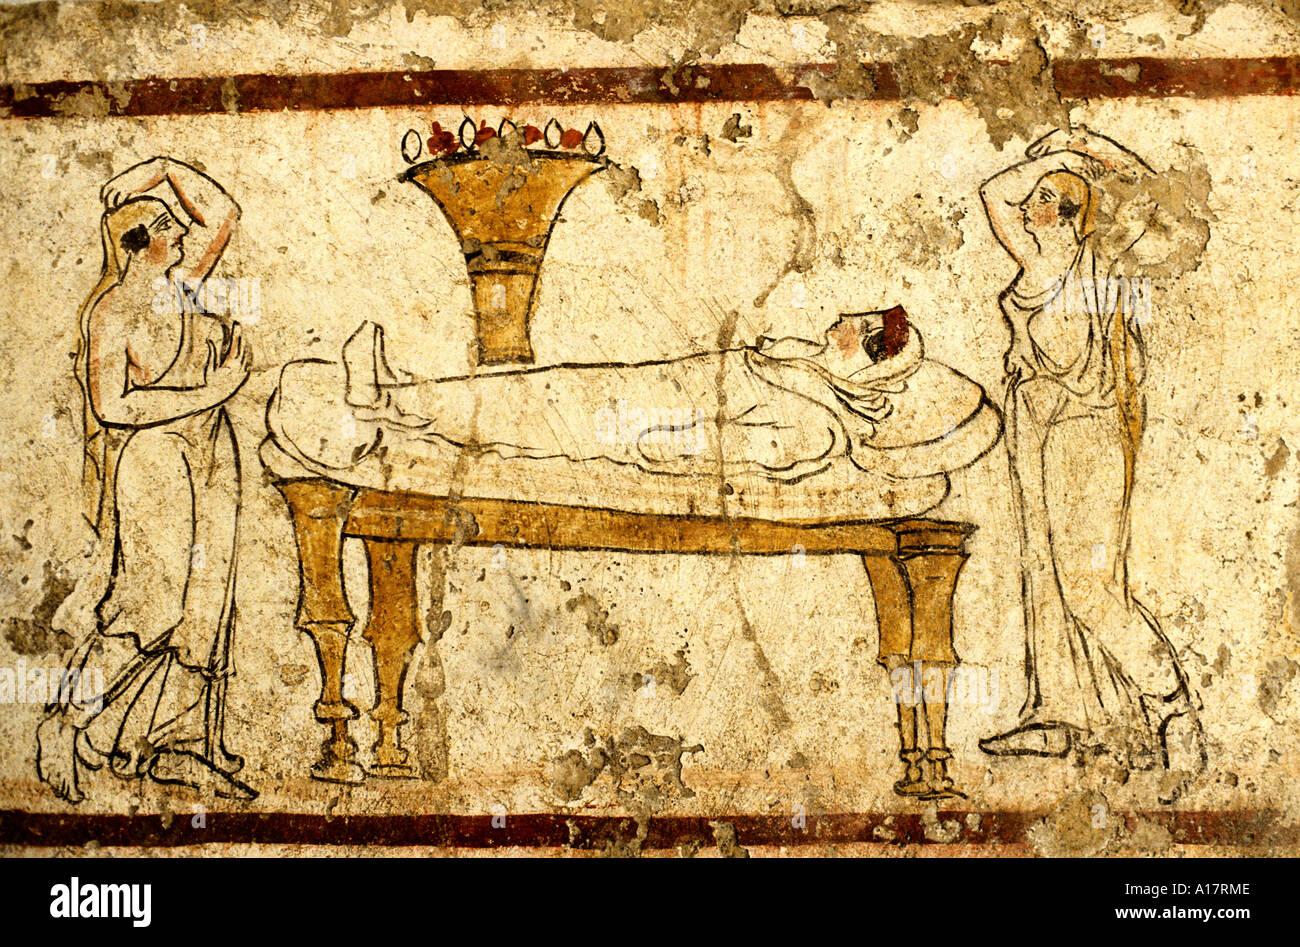 Paestum fresco roman Italy wall painting Stock Photo: 5812365 - Alamy